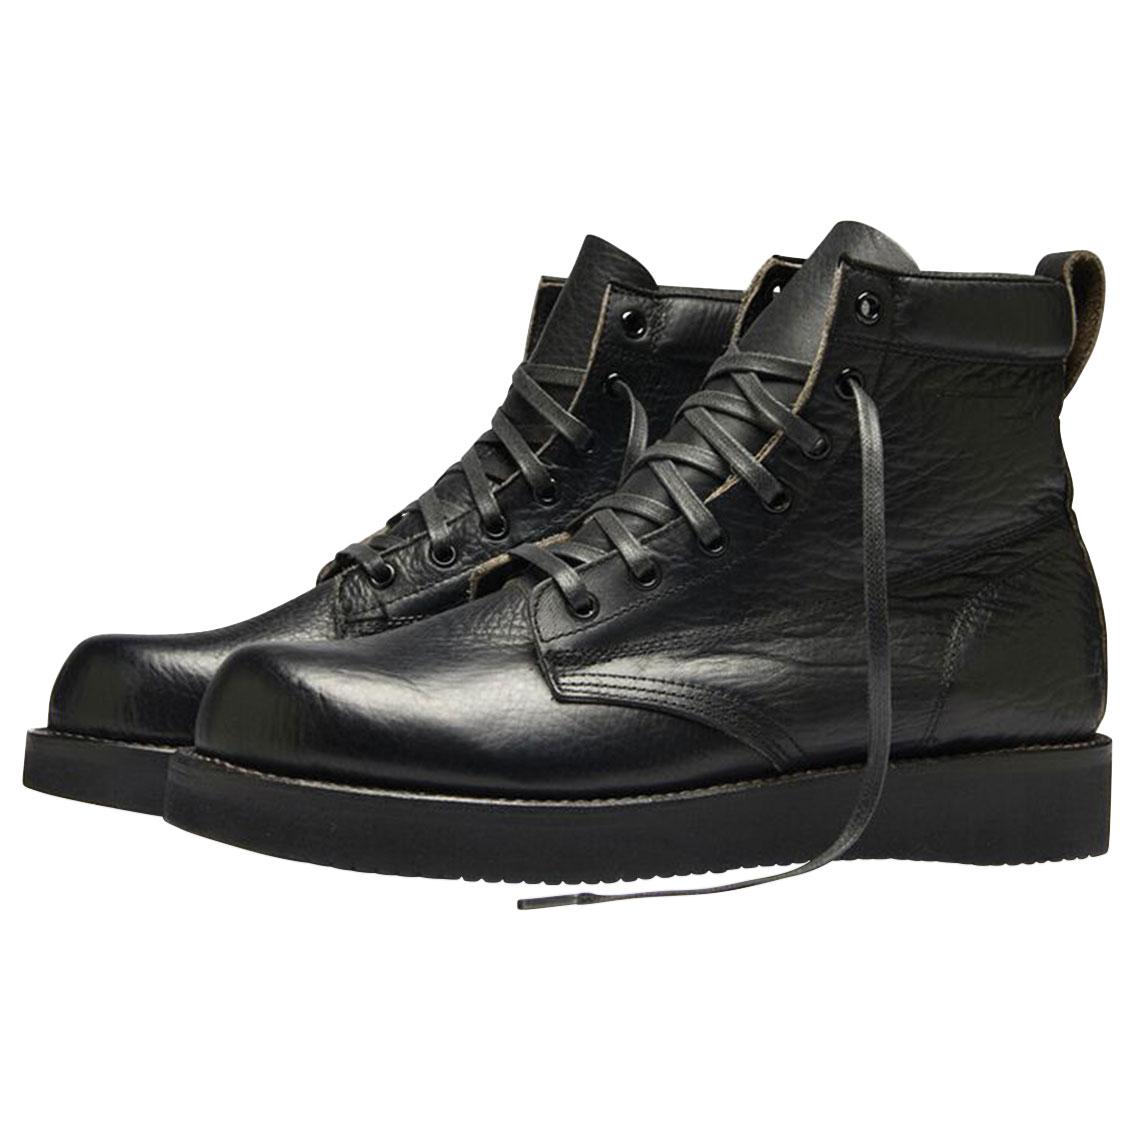 Broken Homme Men's James Black Leather Boots